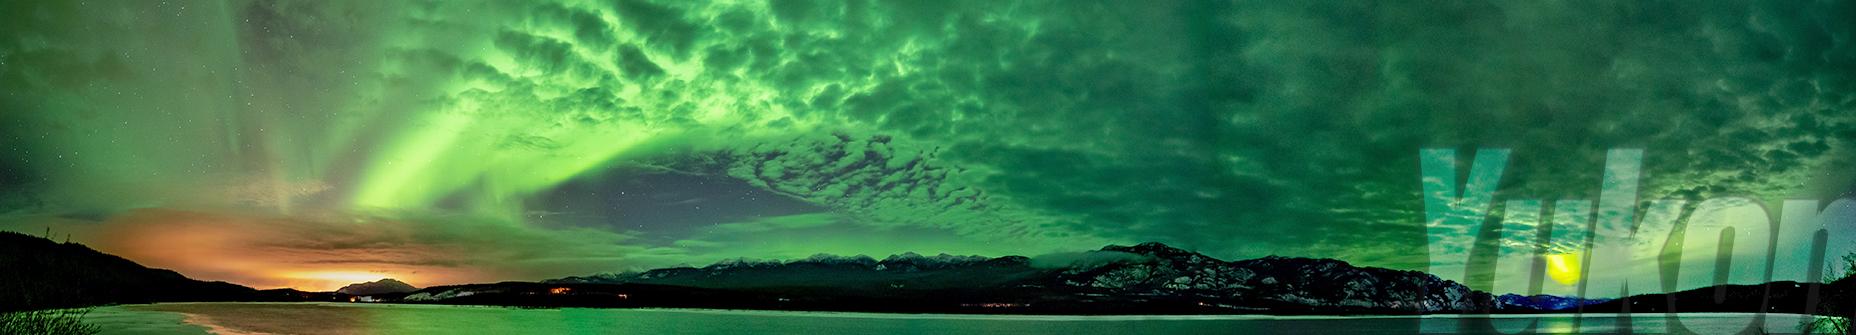 yukon-panorama.jpg